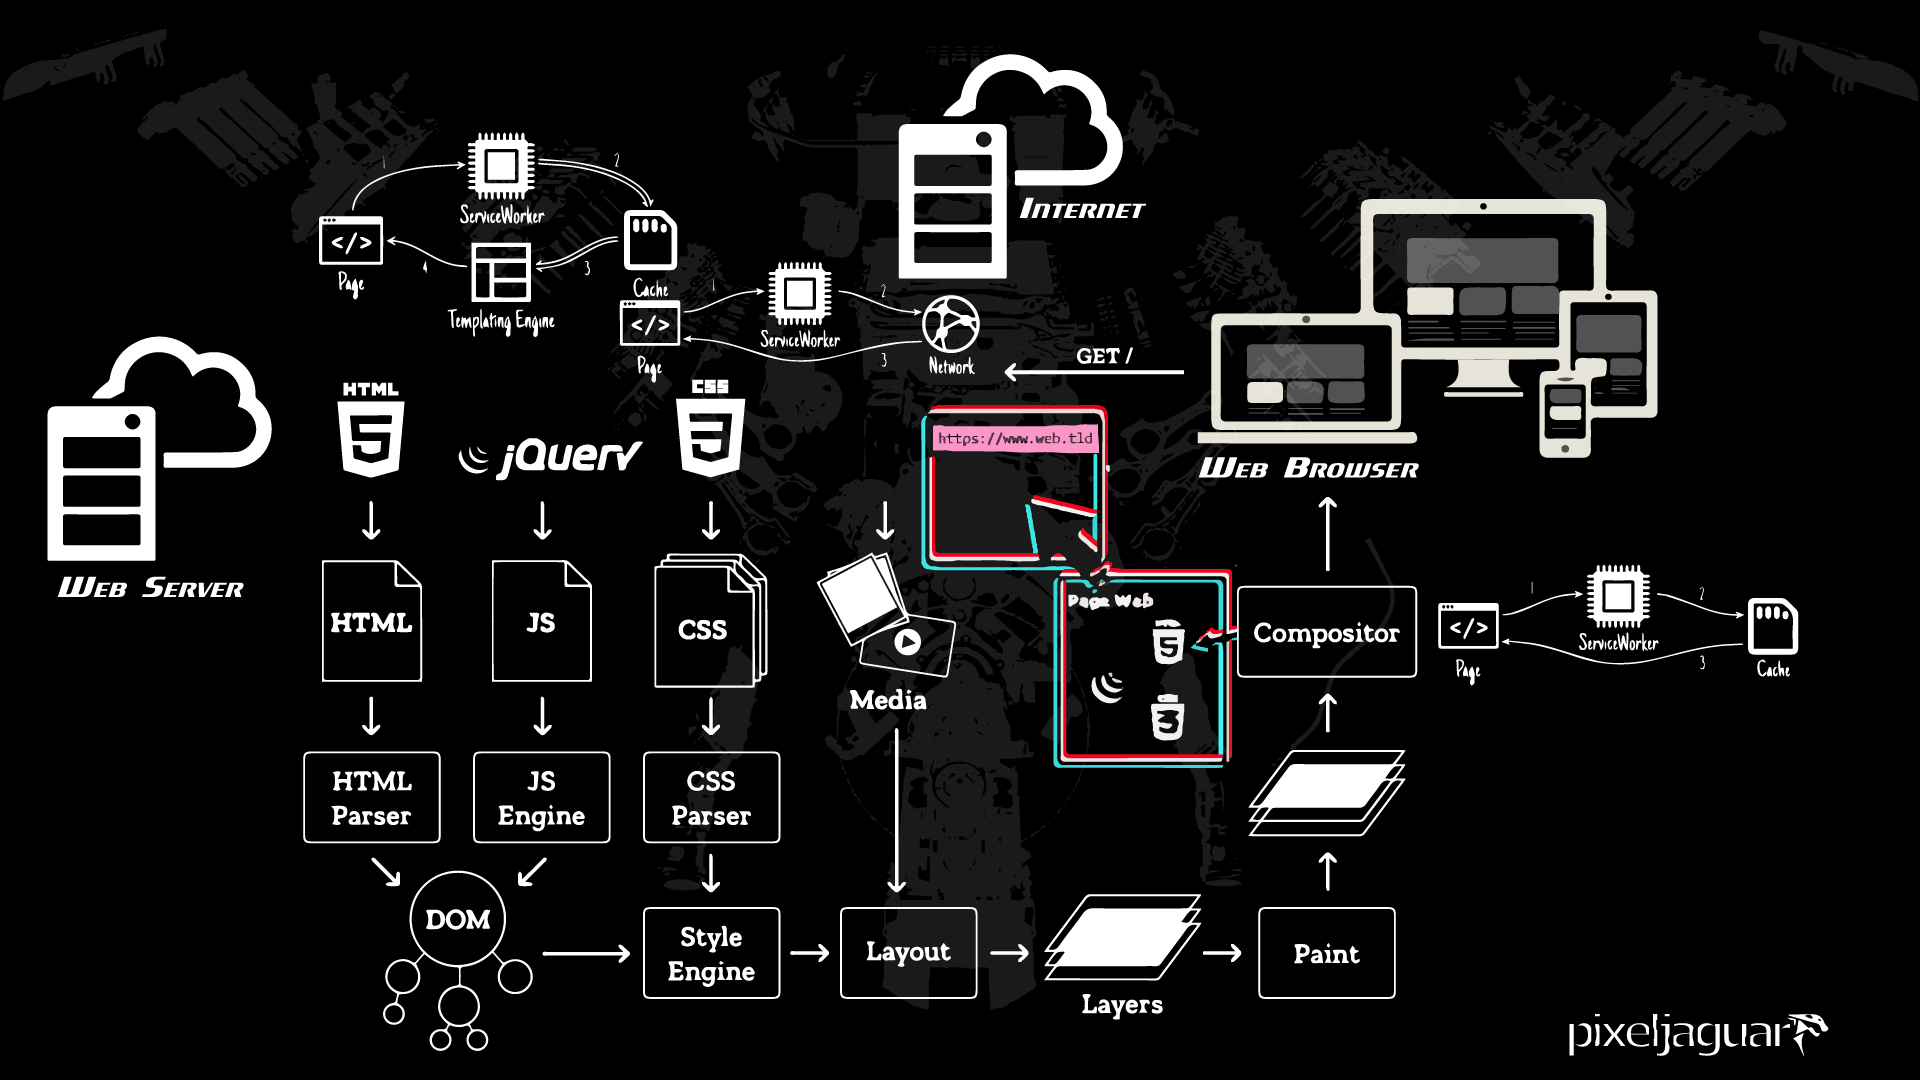 artwork-web-engine-2020-studio-pixeljaguar